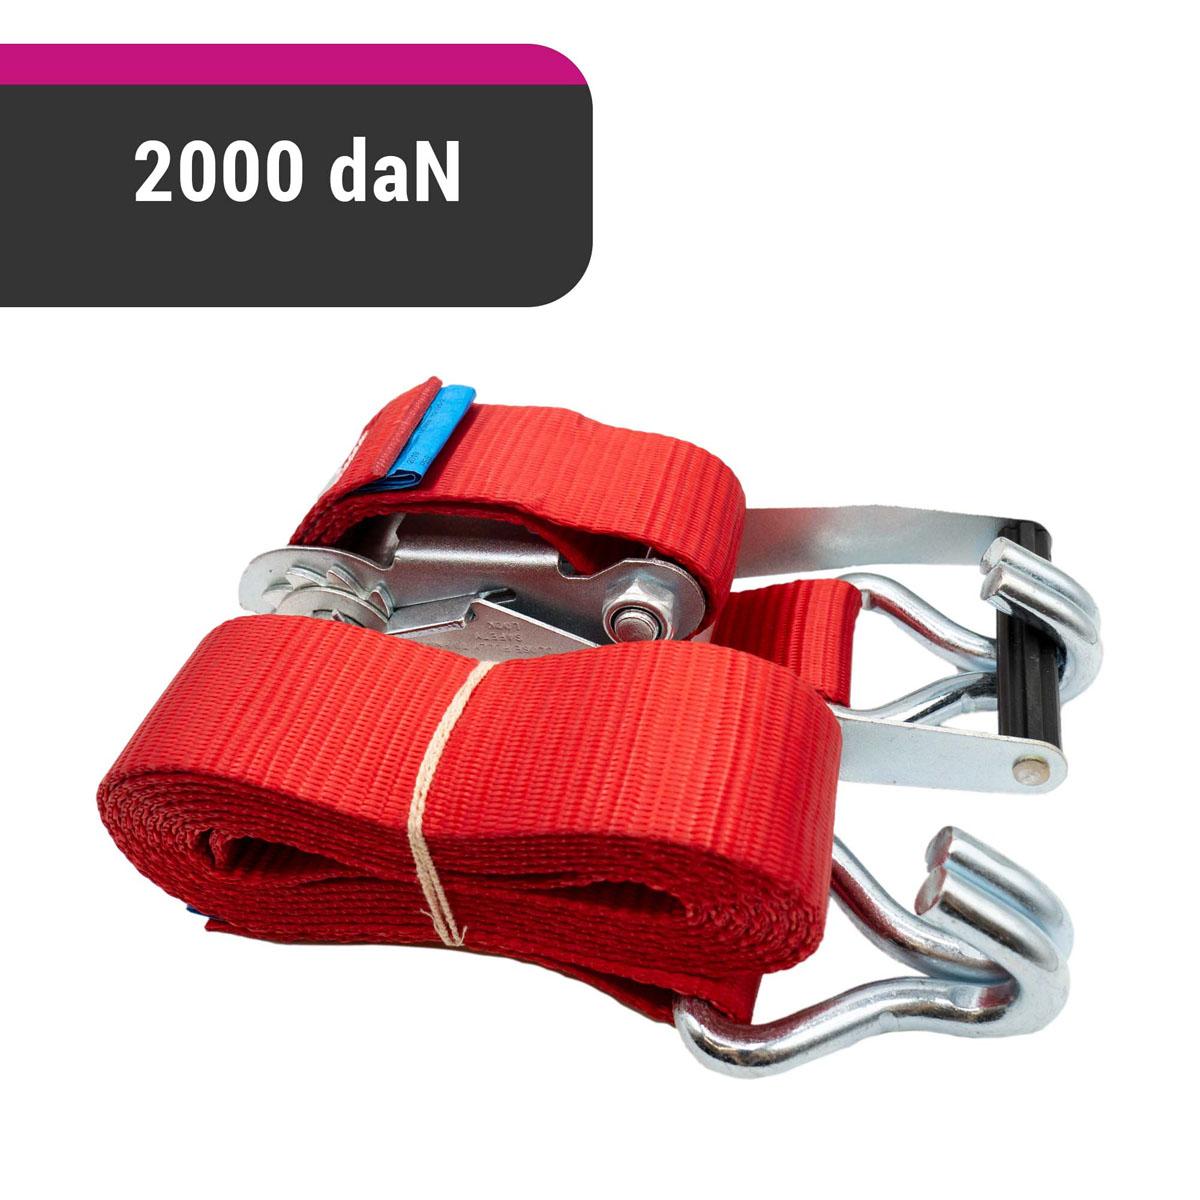 D&W Autotransport Spanngurt 50mm x 3m 2000 daN + 1x Strap 45 cm